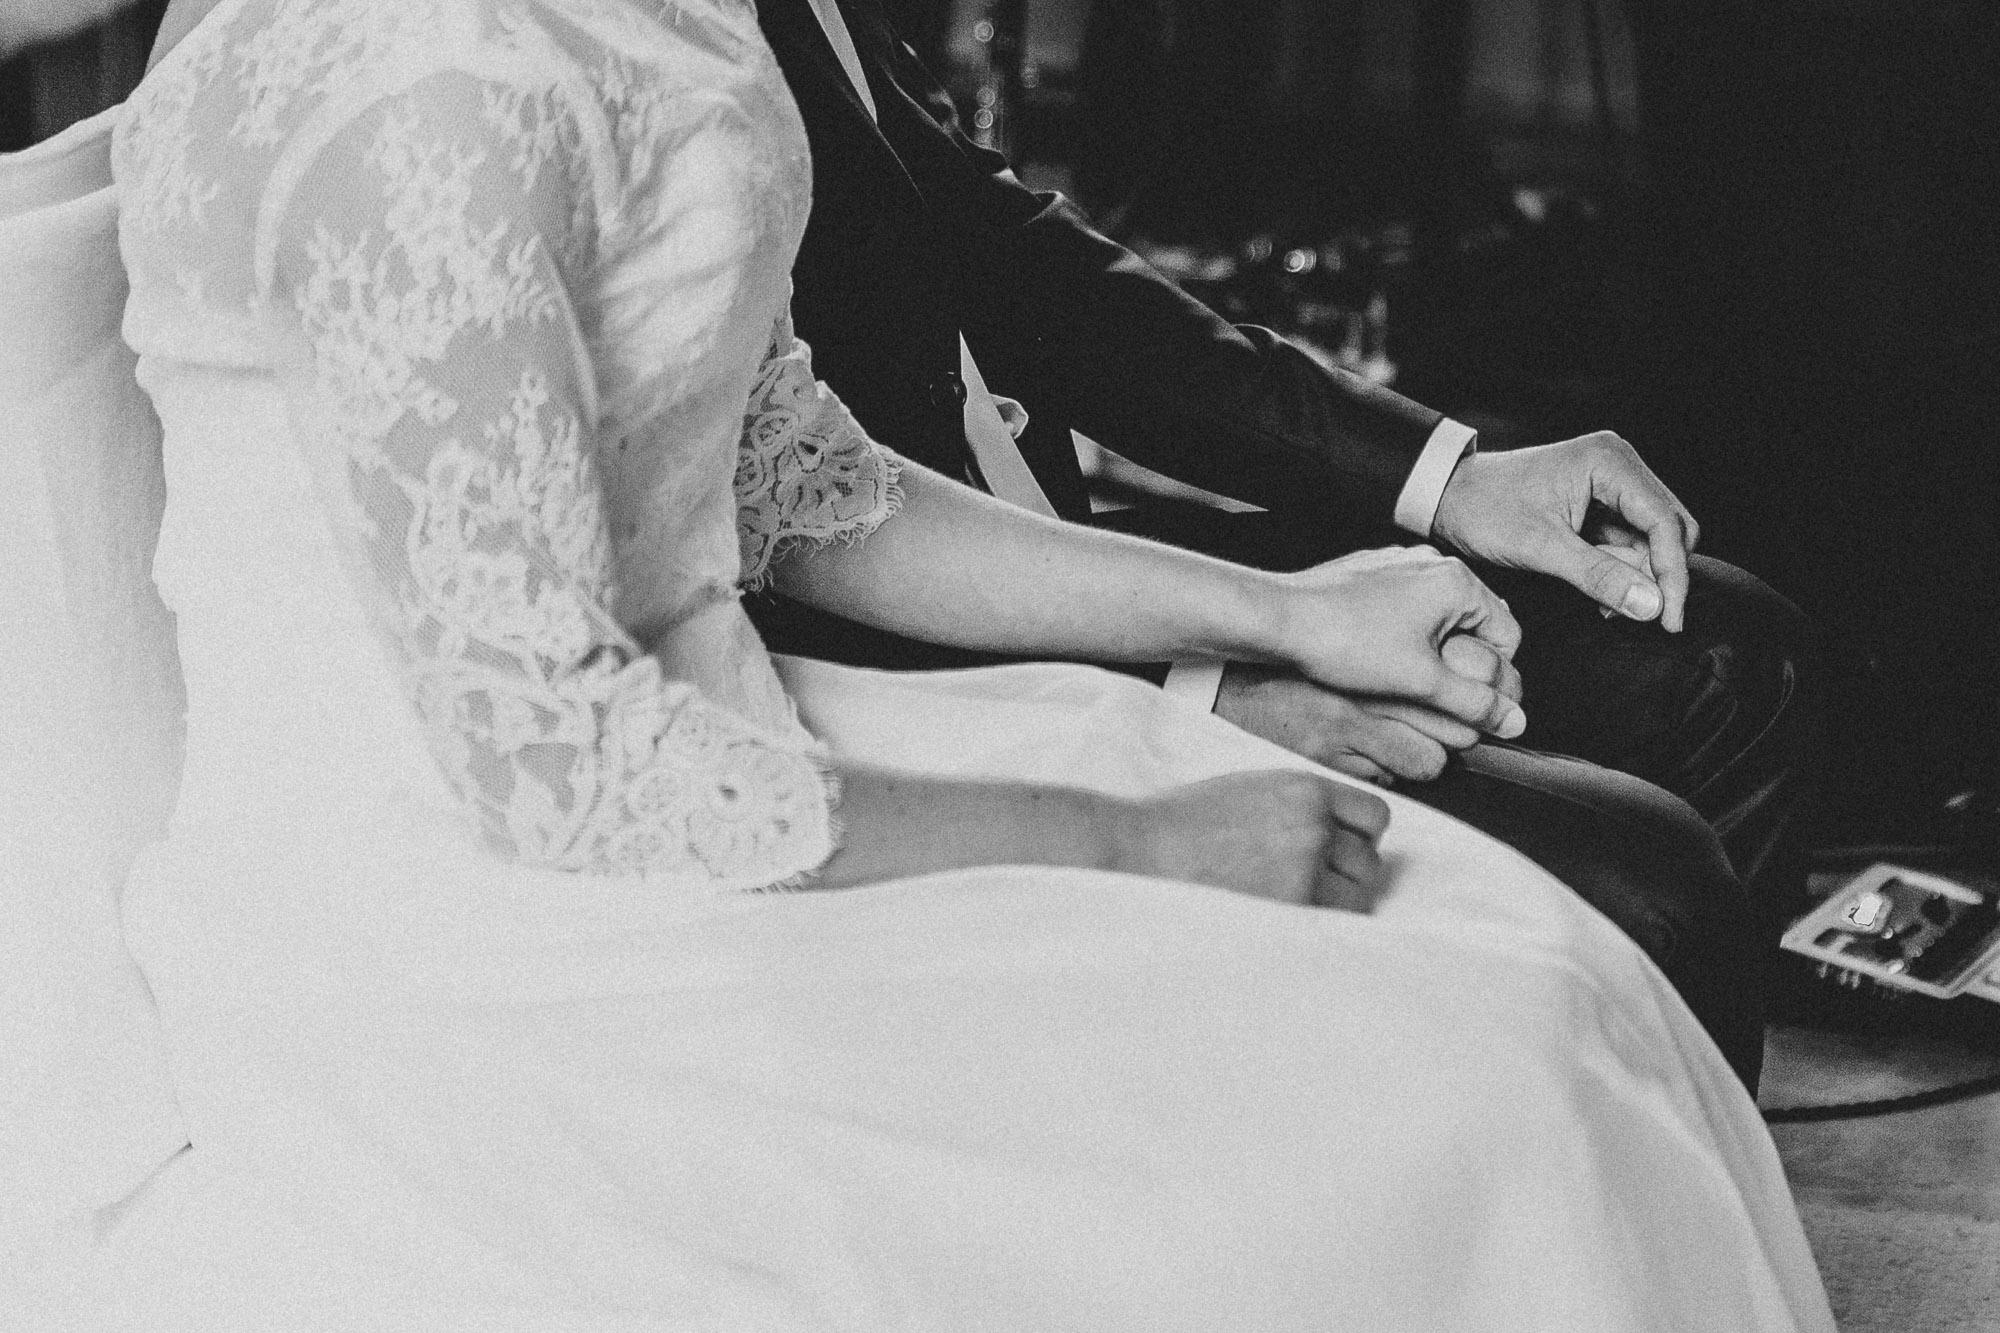 Hochzeitsfotografie-Tuebingen-Doro-Stefan-23